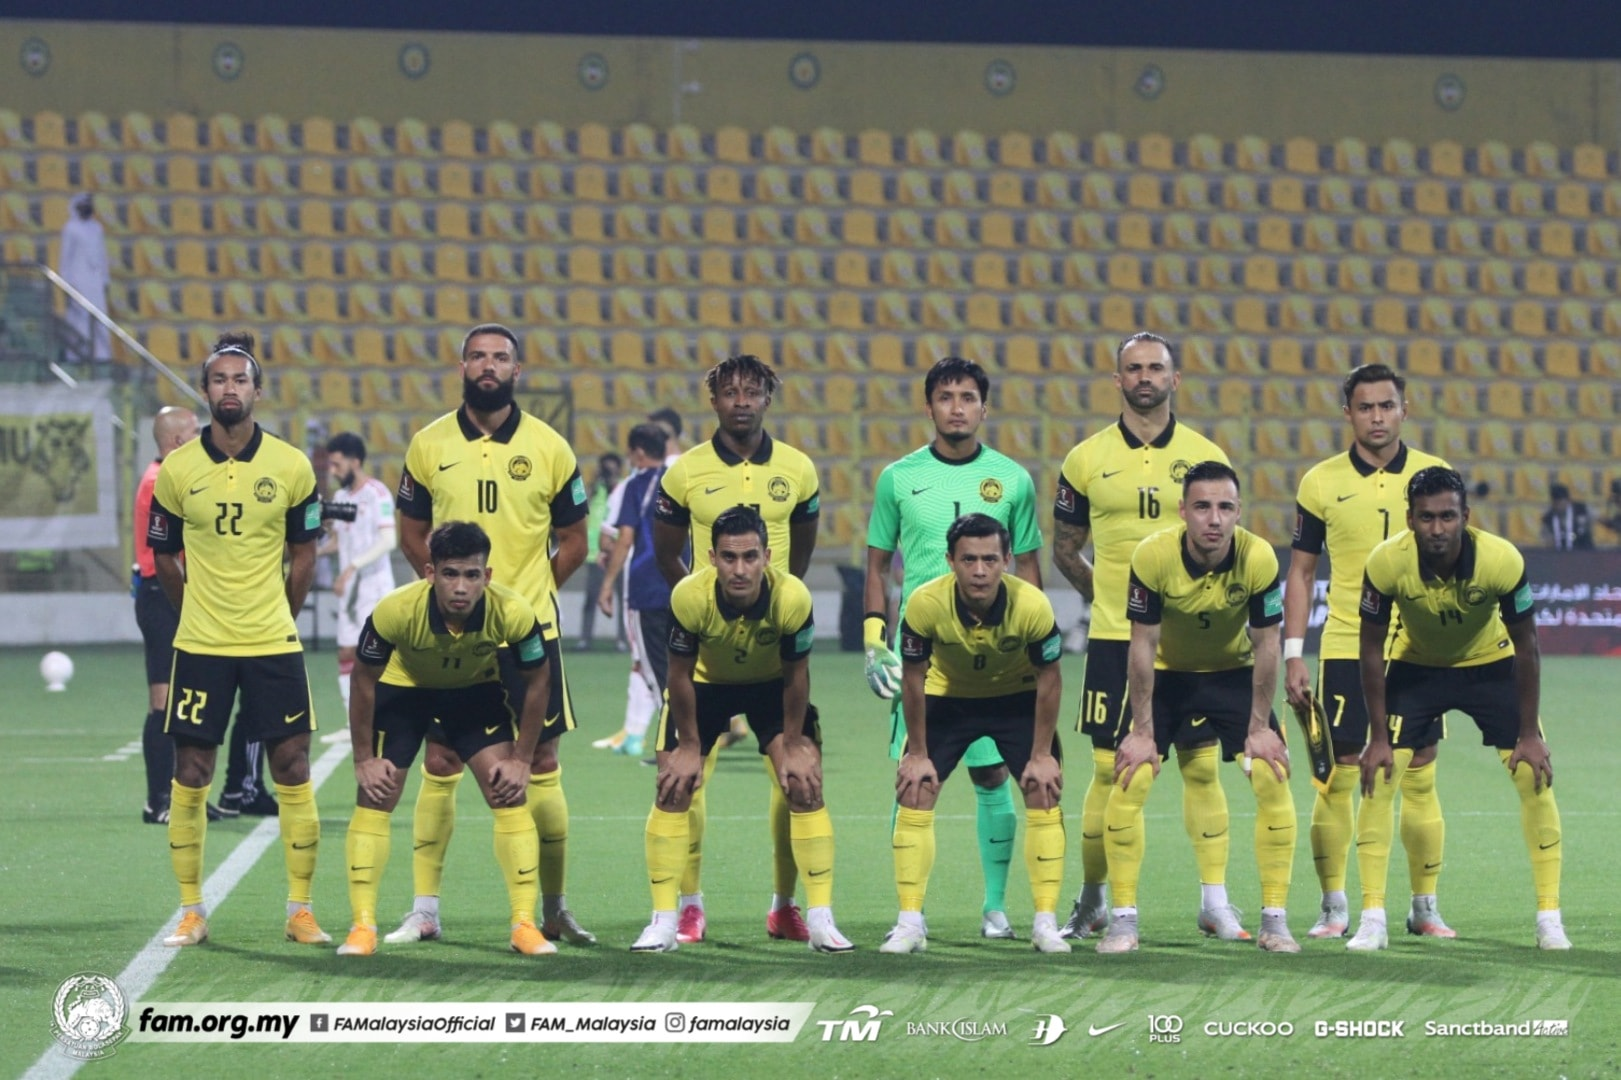 Malaysia UAE 2021 Kesebelasan Utama Harimau Malaya minit permainan